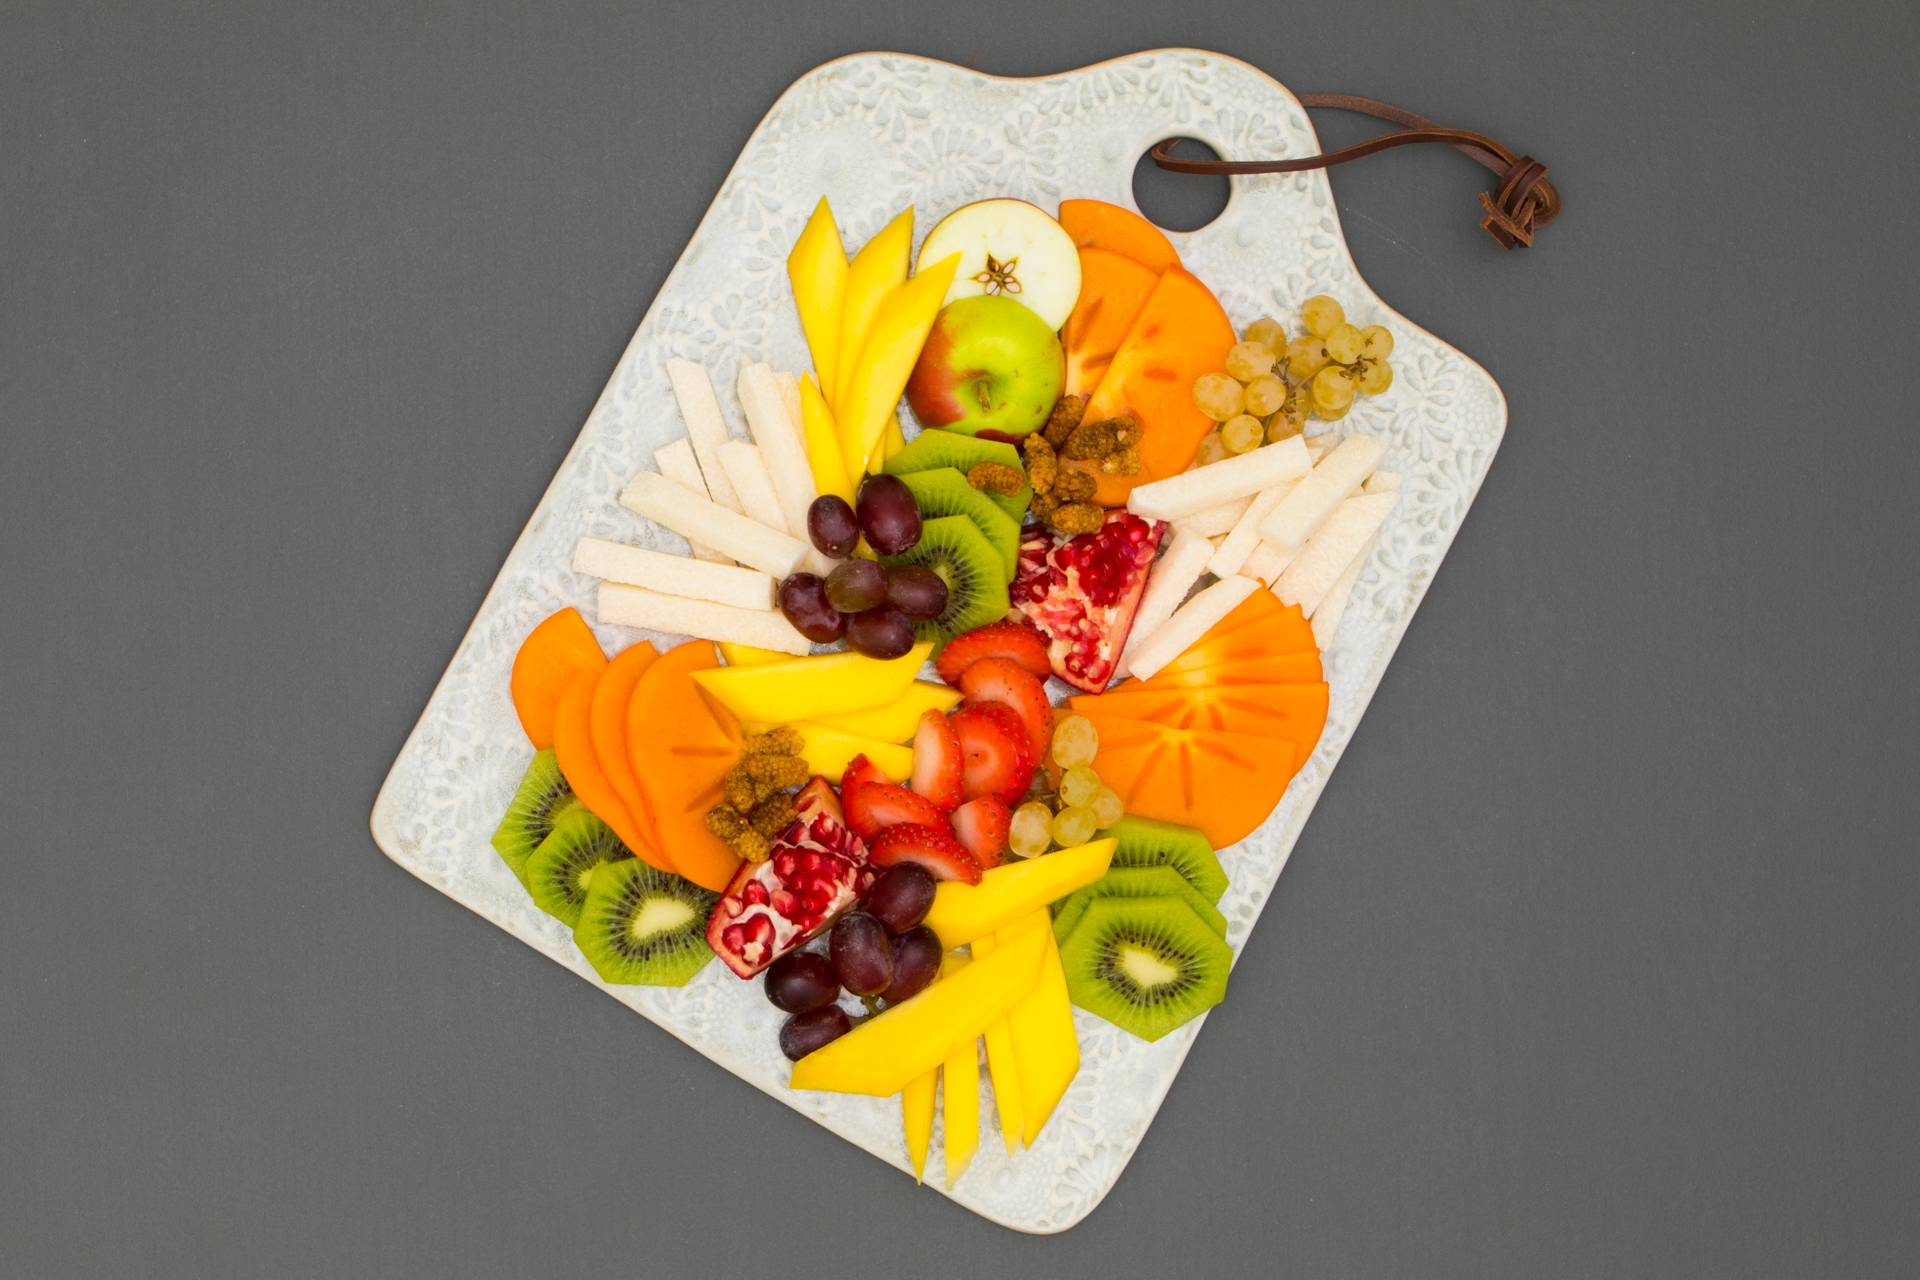 fruit for breast cancer prevention